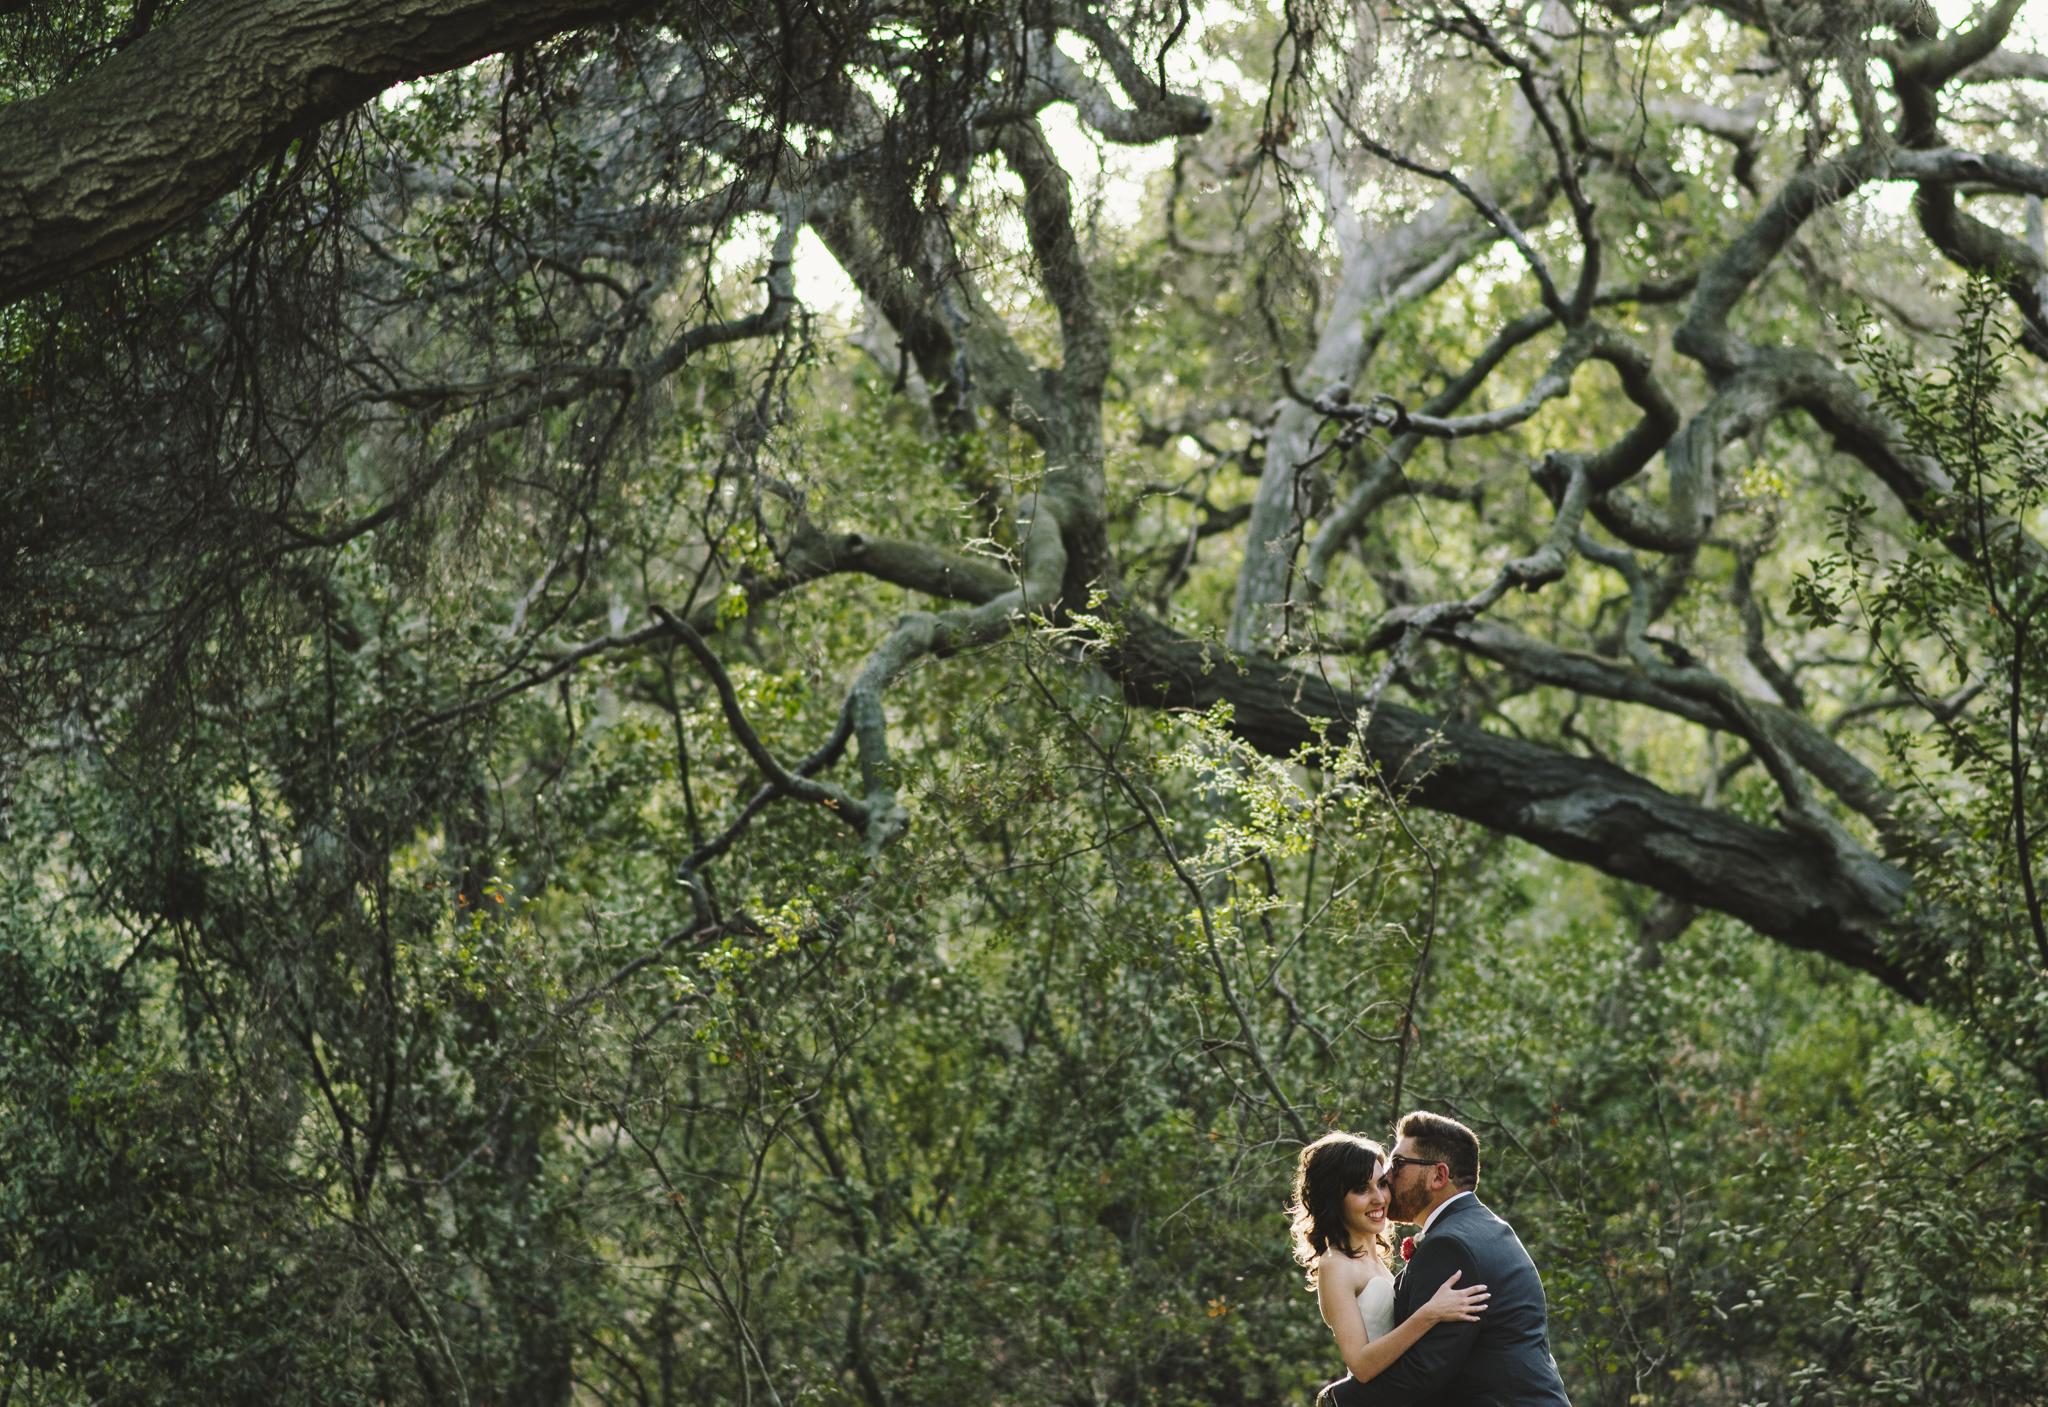 Isaiah & Taylor Photography - Los Angeles Lifestyle Wedding Photographer-26.jpg